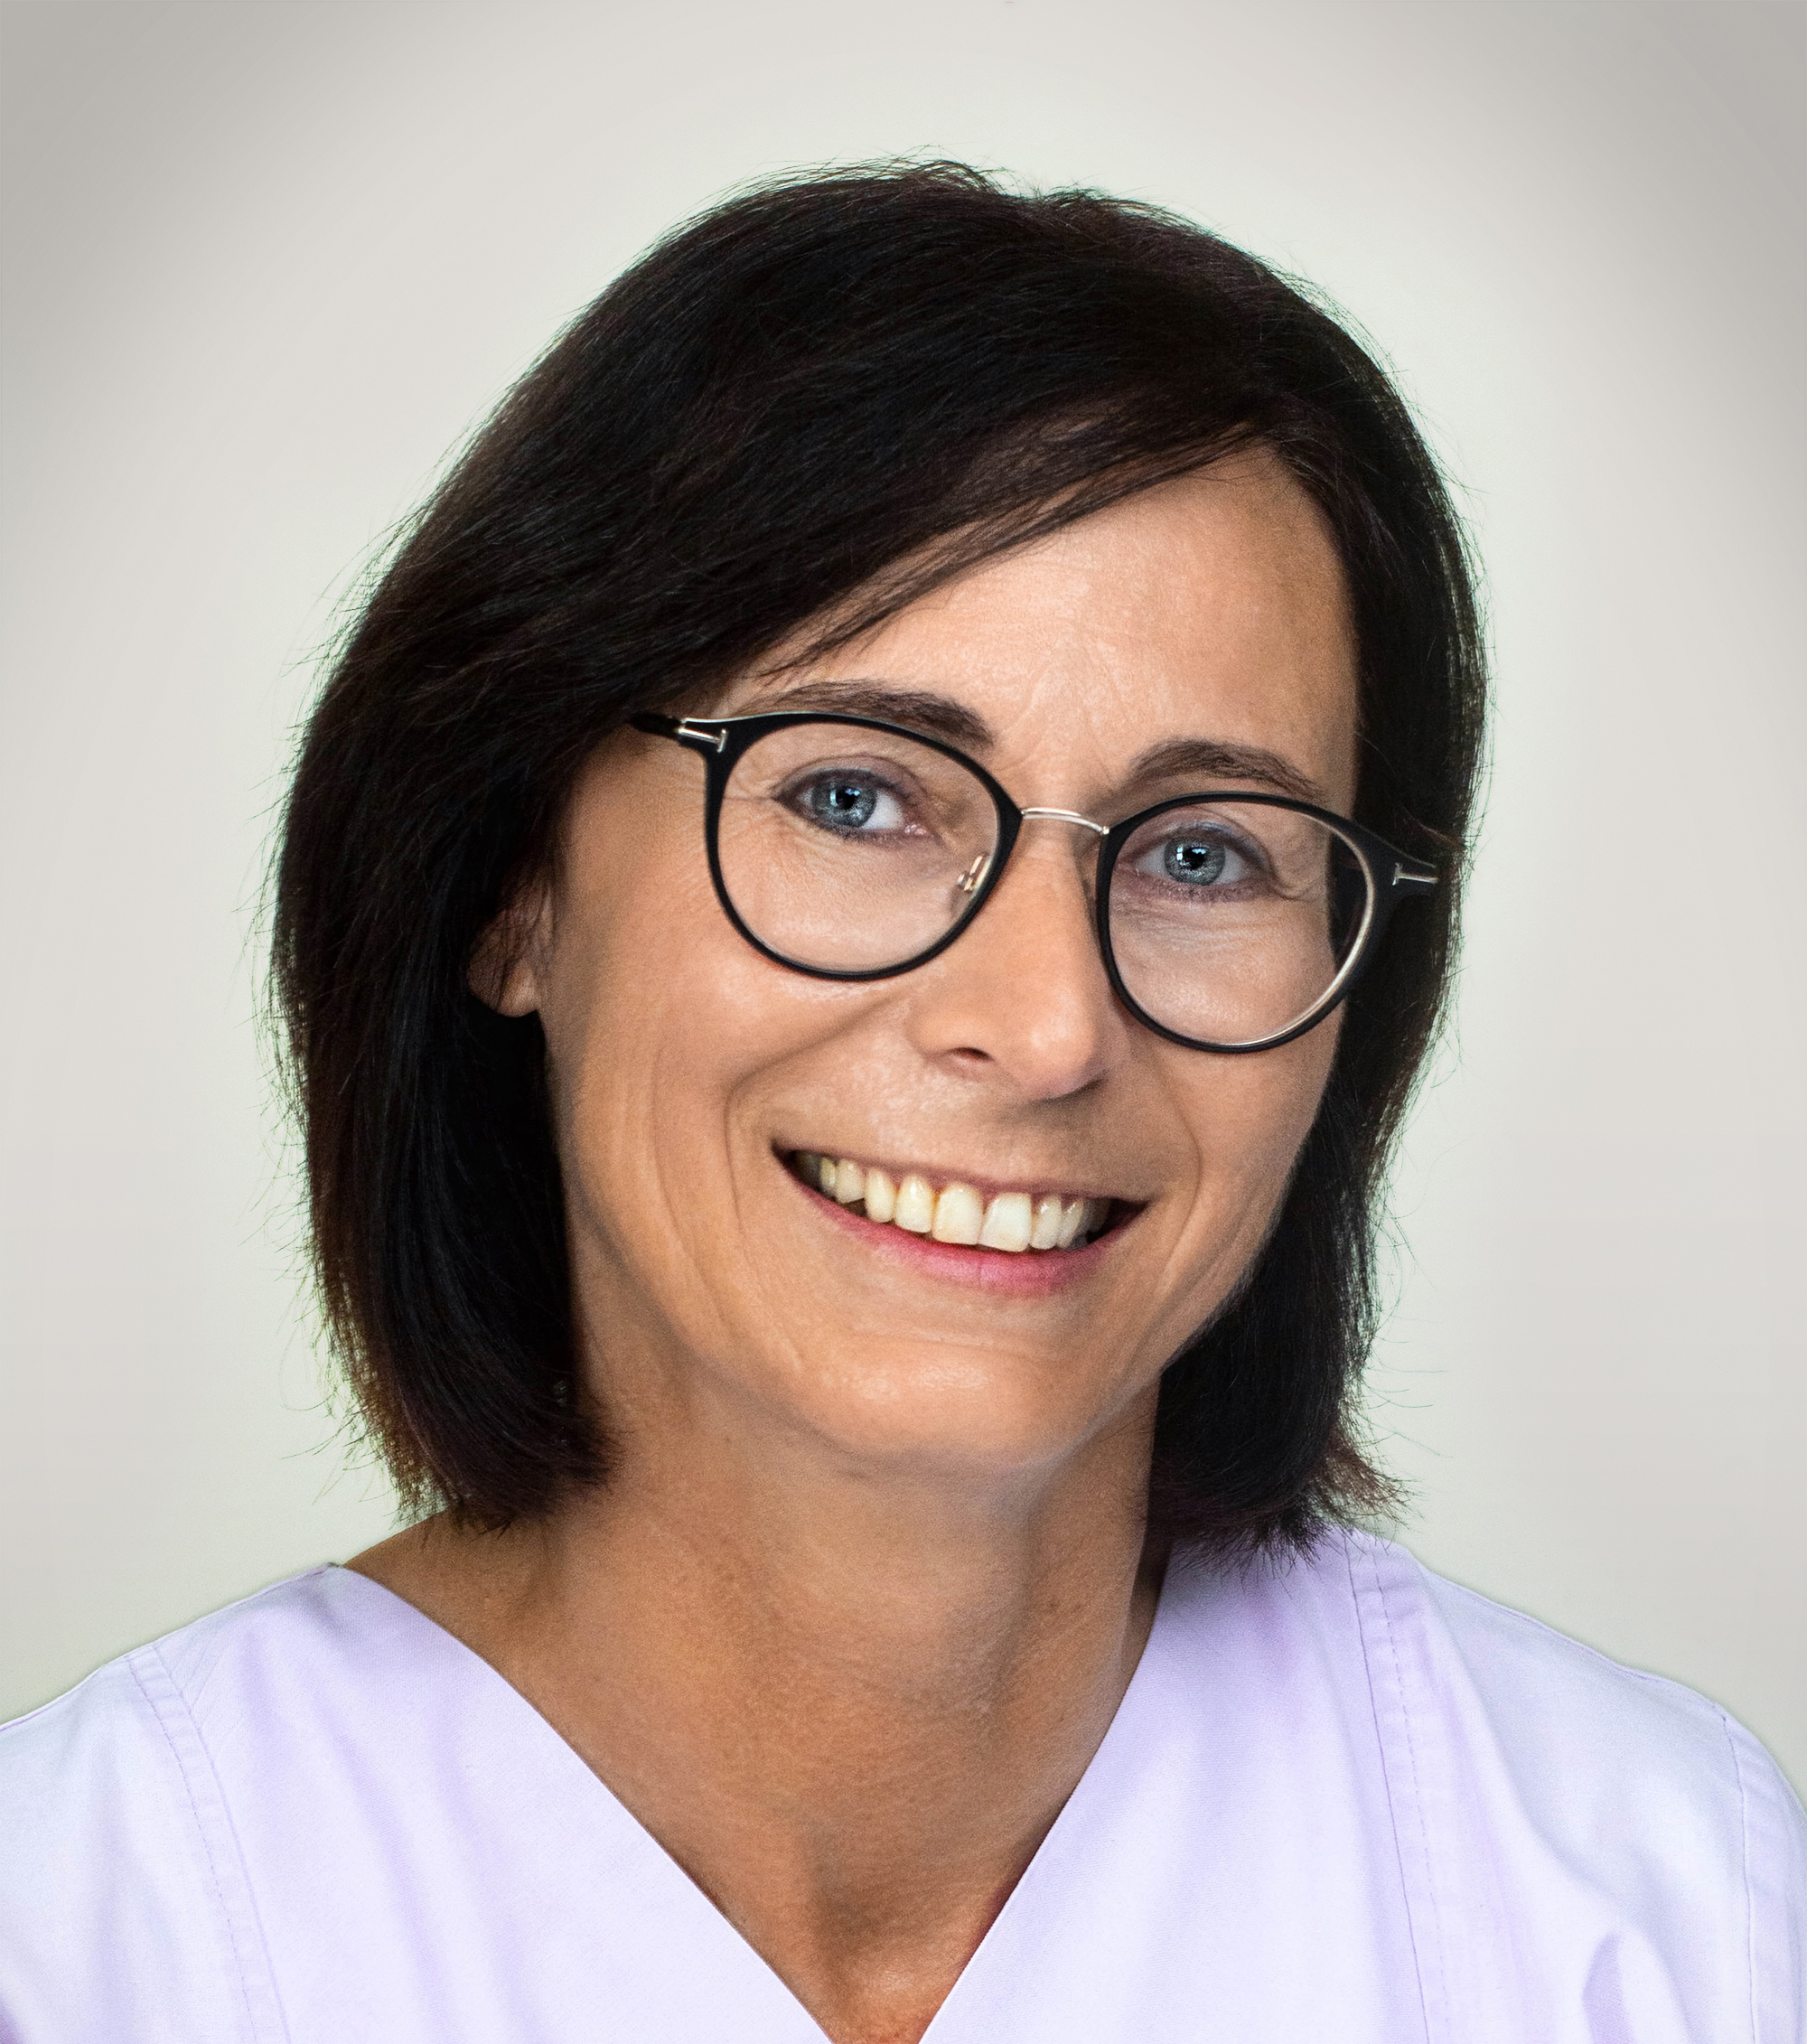 Anita Eidenhammer